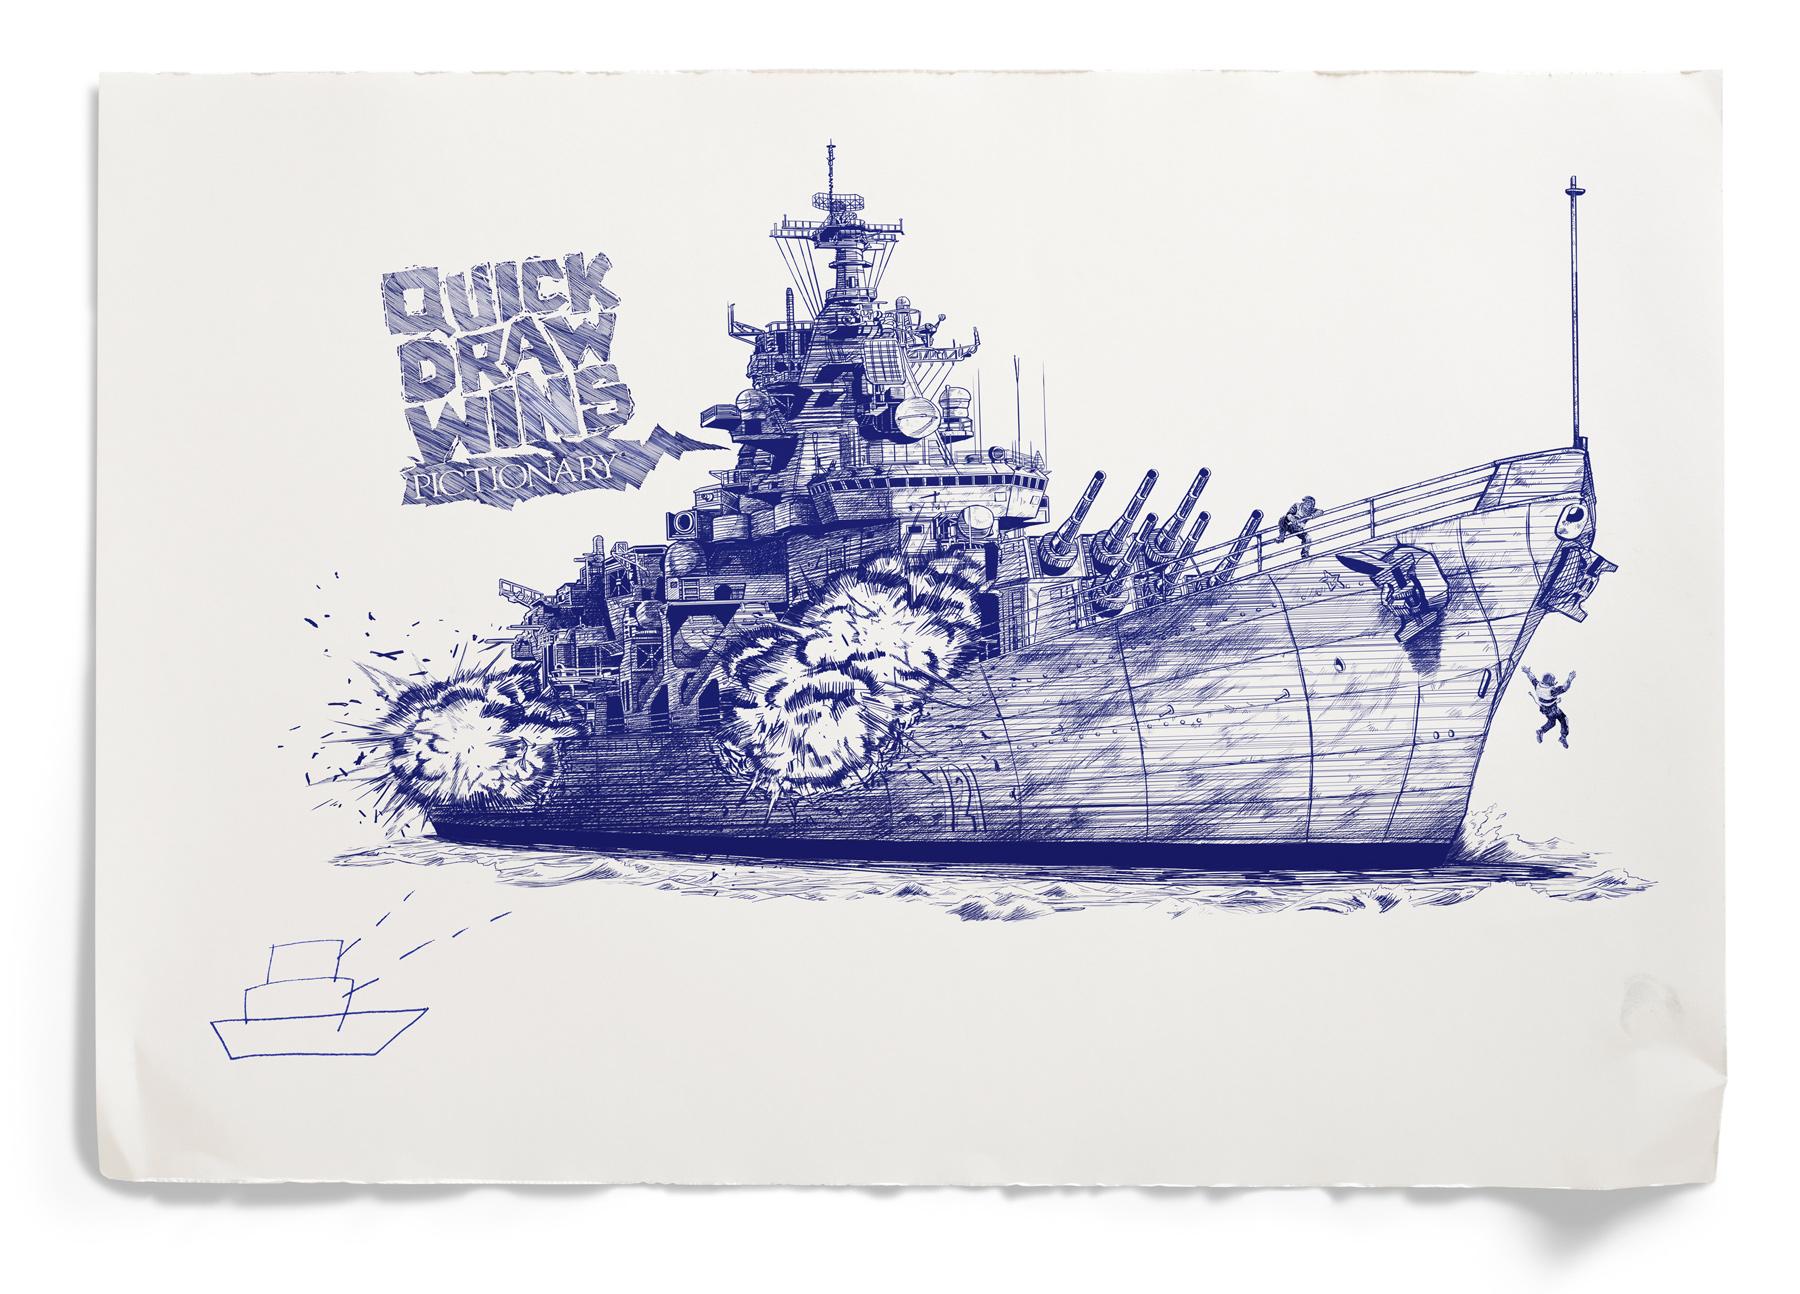 Drawn advertisement pictionary Ad of Ads Battleship Battleship